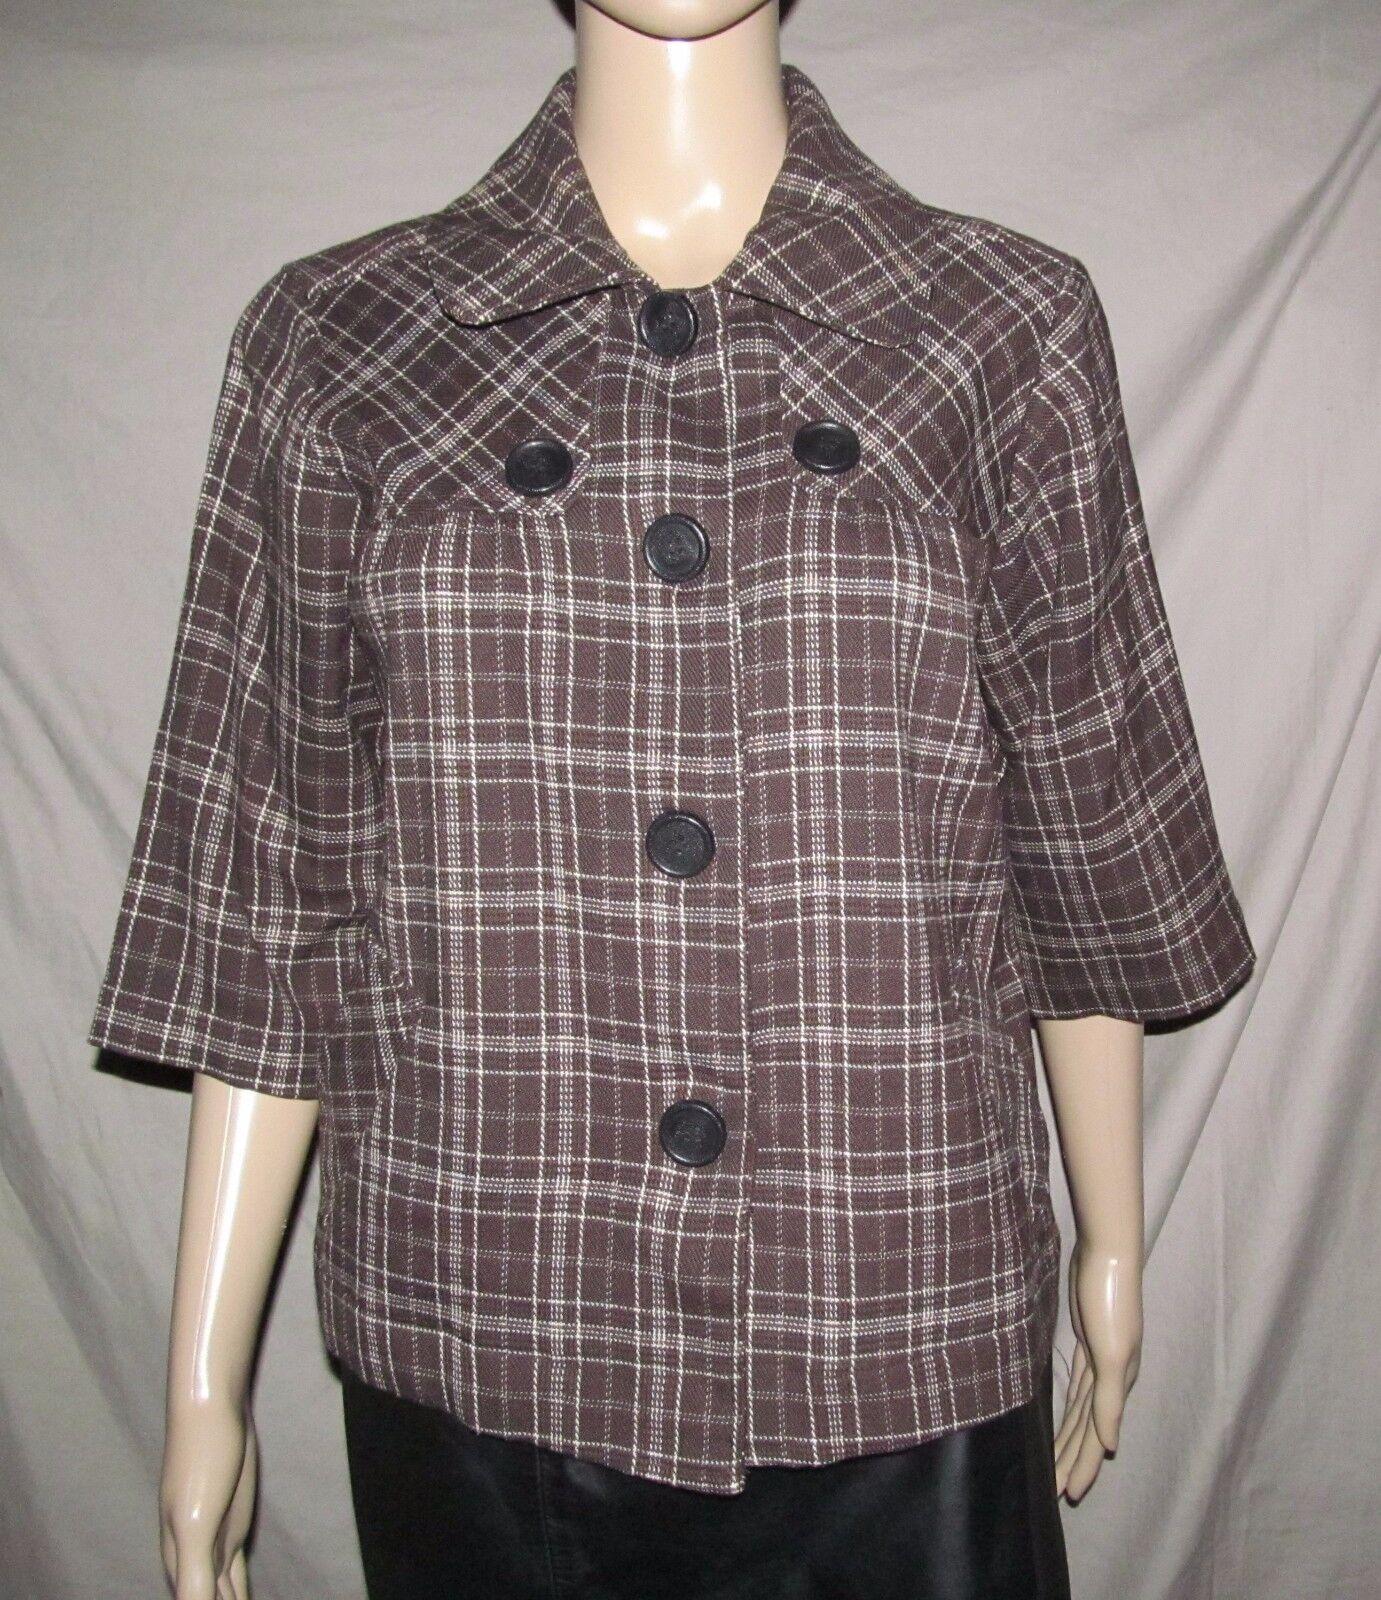 BACCINI Retro 1950s / 1960s Brown Plaid Front Button jacket Women's M Medium